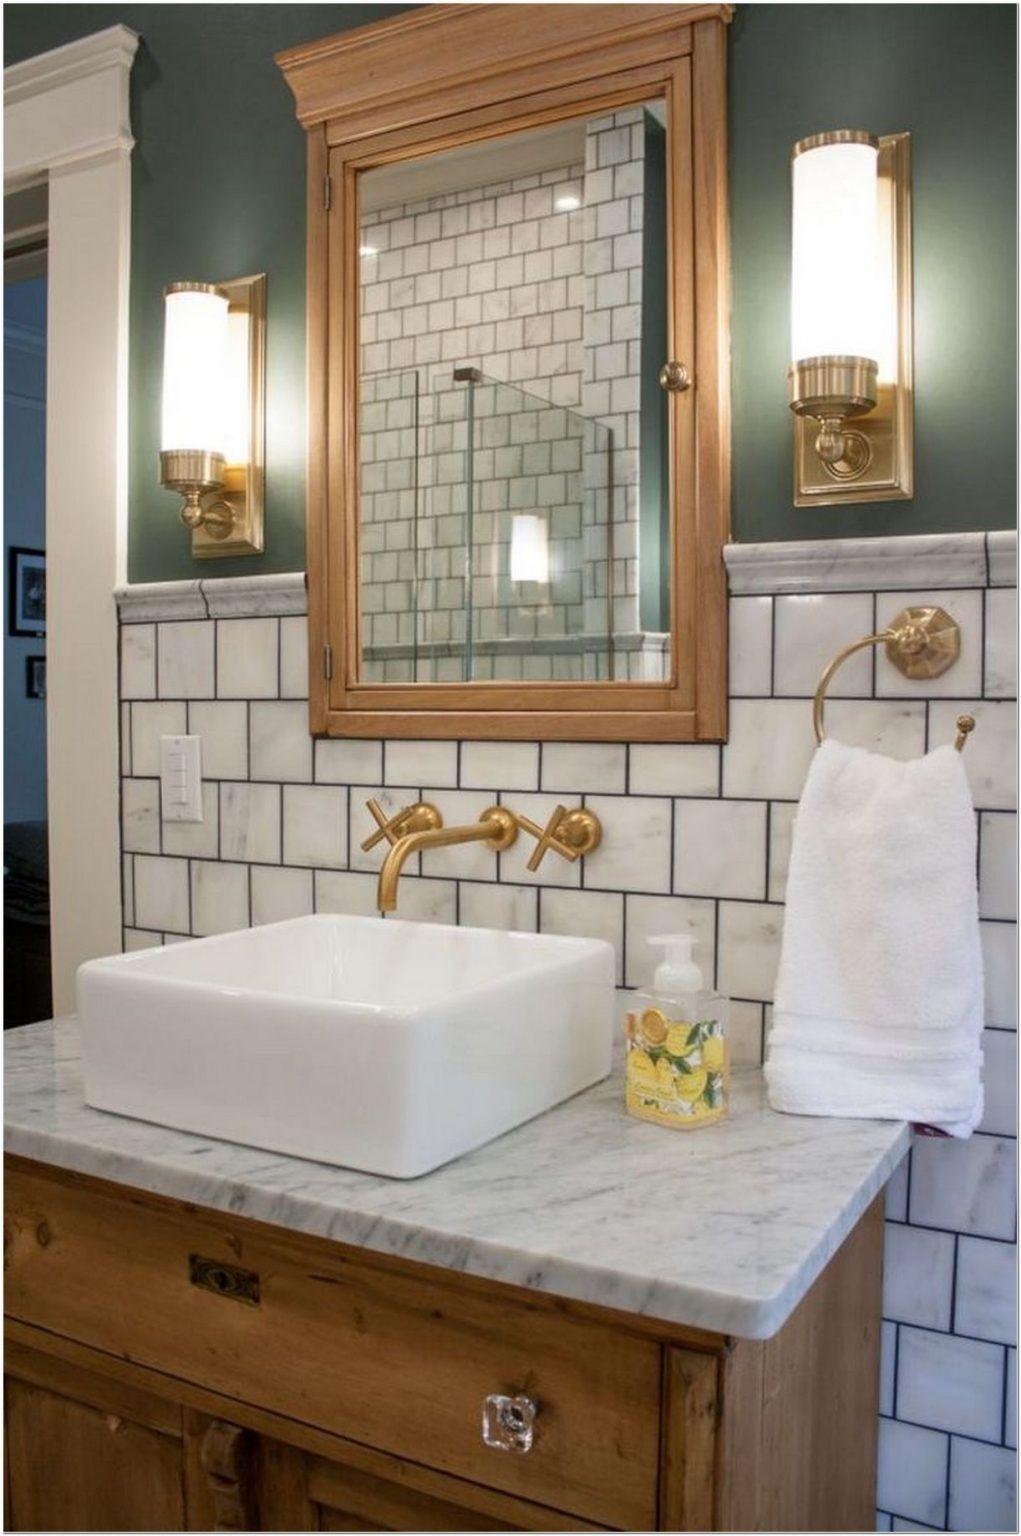 77 cool half bathroom ideas and designs you should see in on bathroom renovation ideas 2020 id=22279